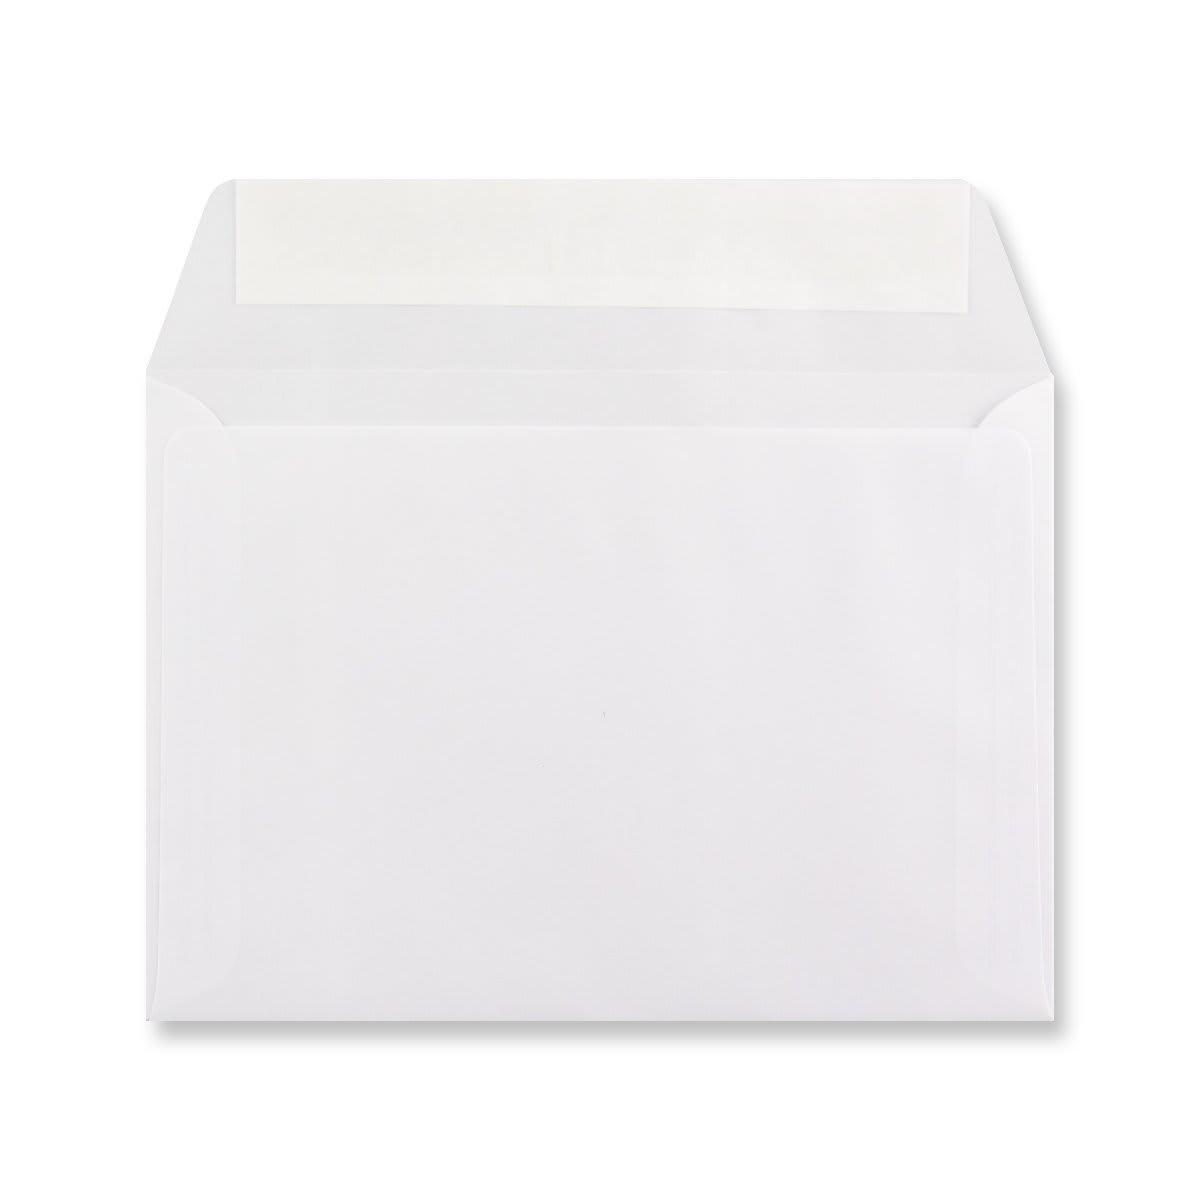 C6 WHITE TRANSLUCENT ENVELOPES